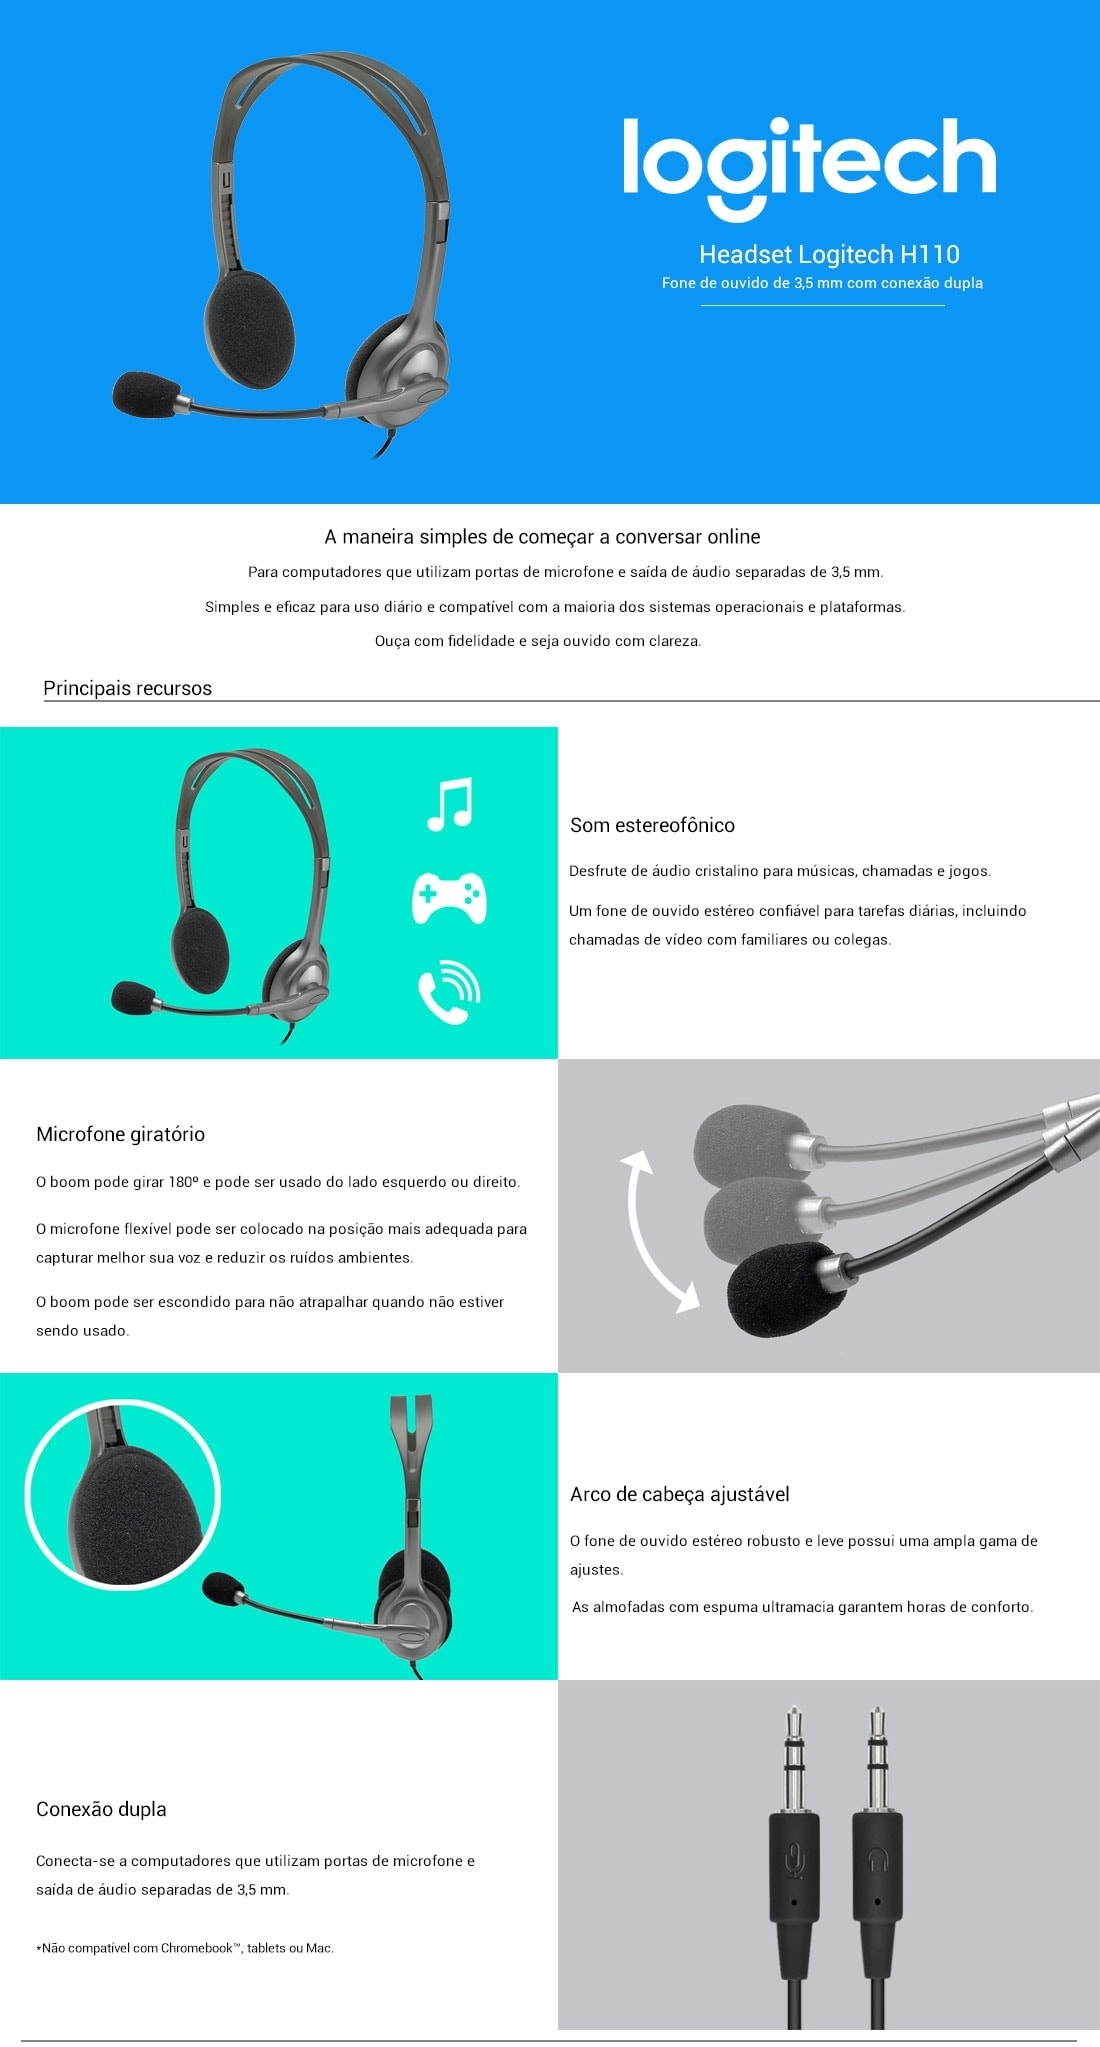 Fone De Ouvido Headset Logitech Stereo H110 Dhcp Informtica Informaes